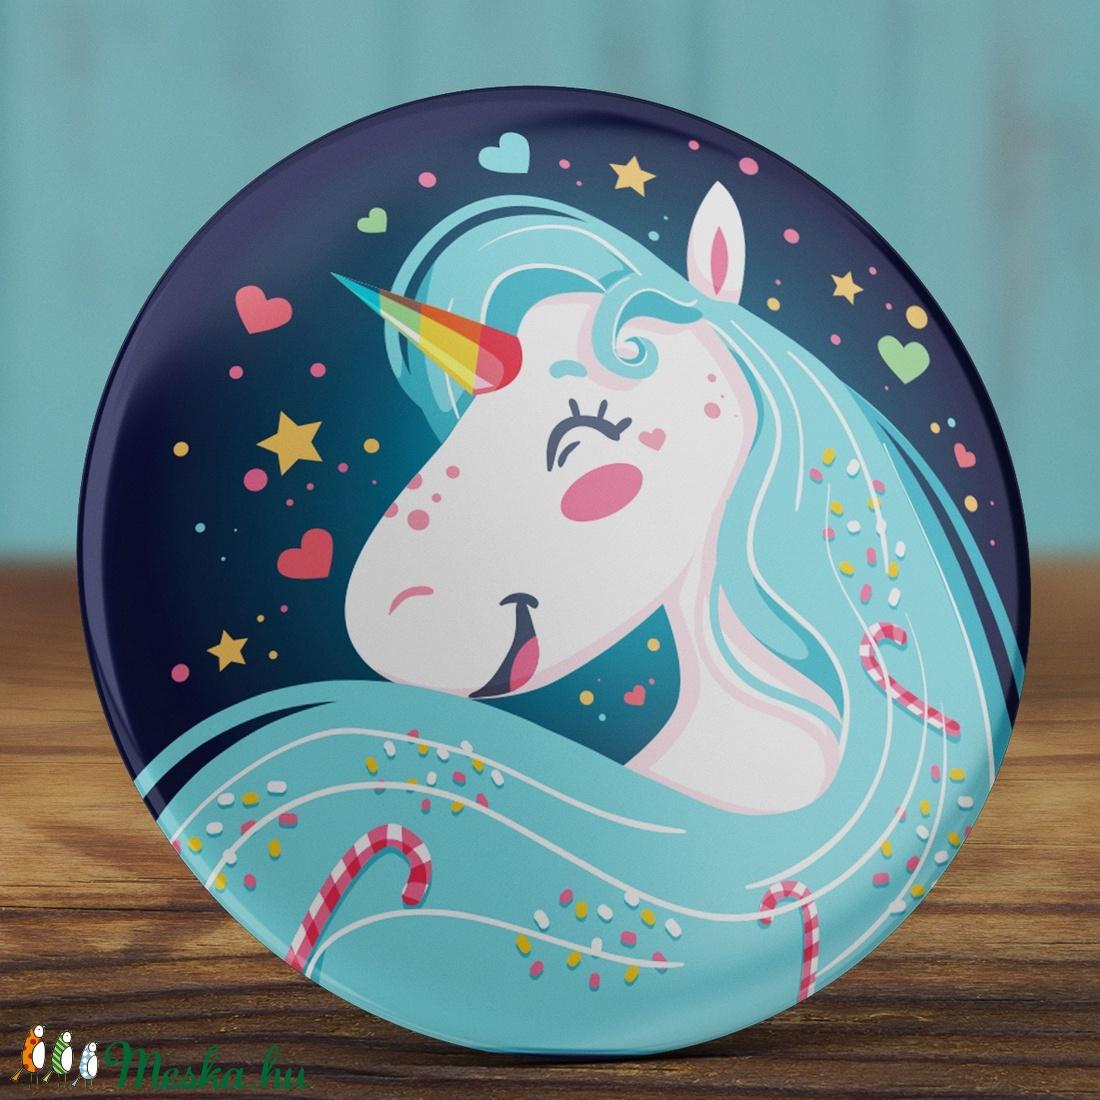 Unikornis tükör  - cuki zsebtükör  - cukorka - ló - unicorn - vidám unikornis tükör  - szív - csillag - kék - lány (AngelPin) - Meska.hu